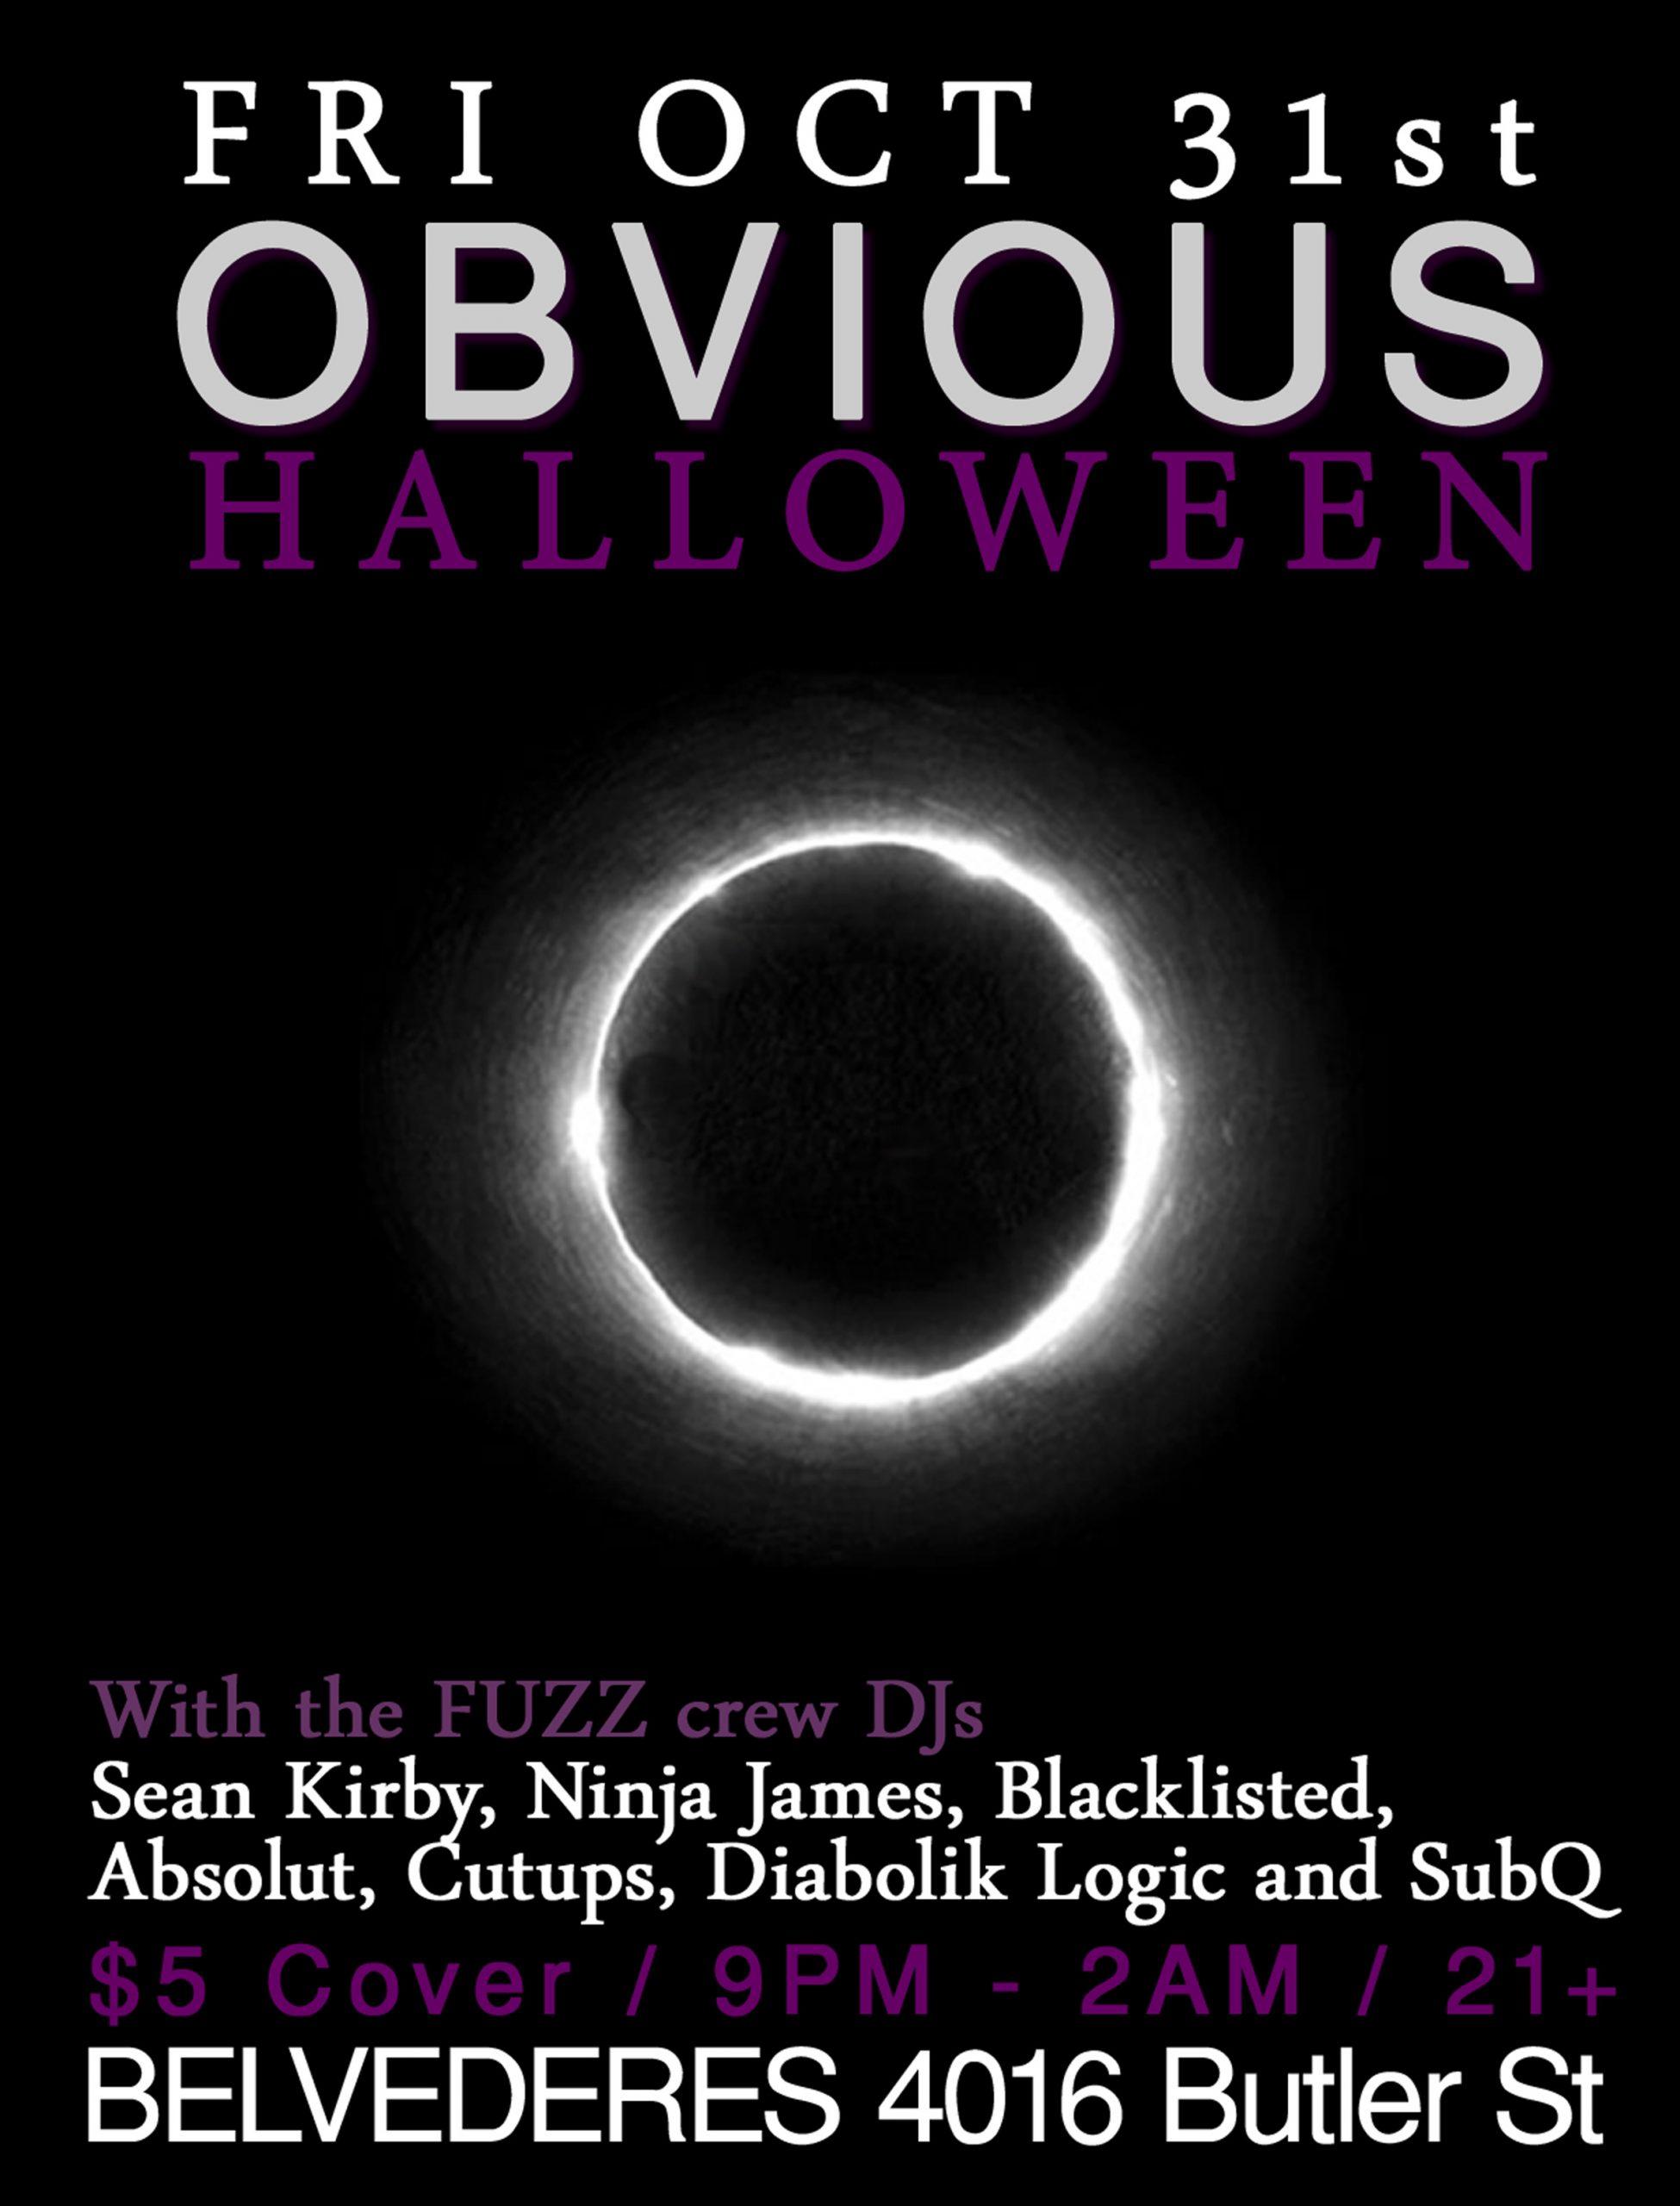 Fri Oct 31st OBVIOUS: Halloween w/ FUZZ crew @ Belvederes